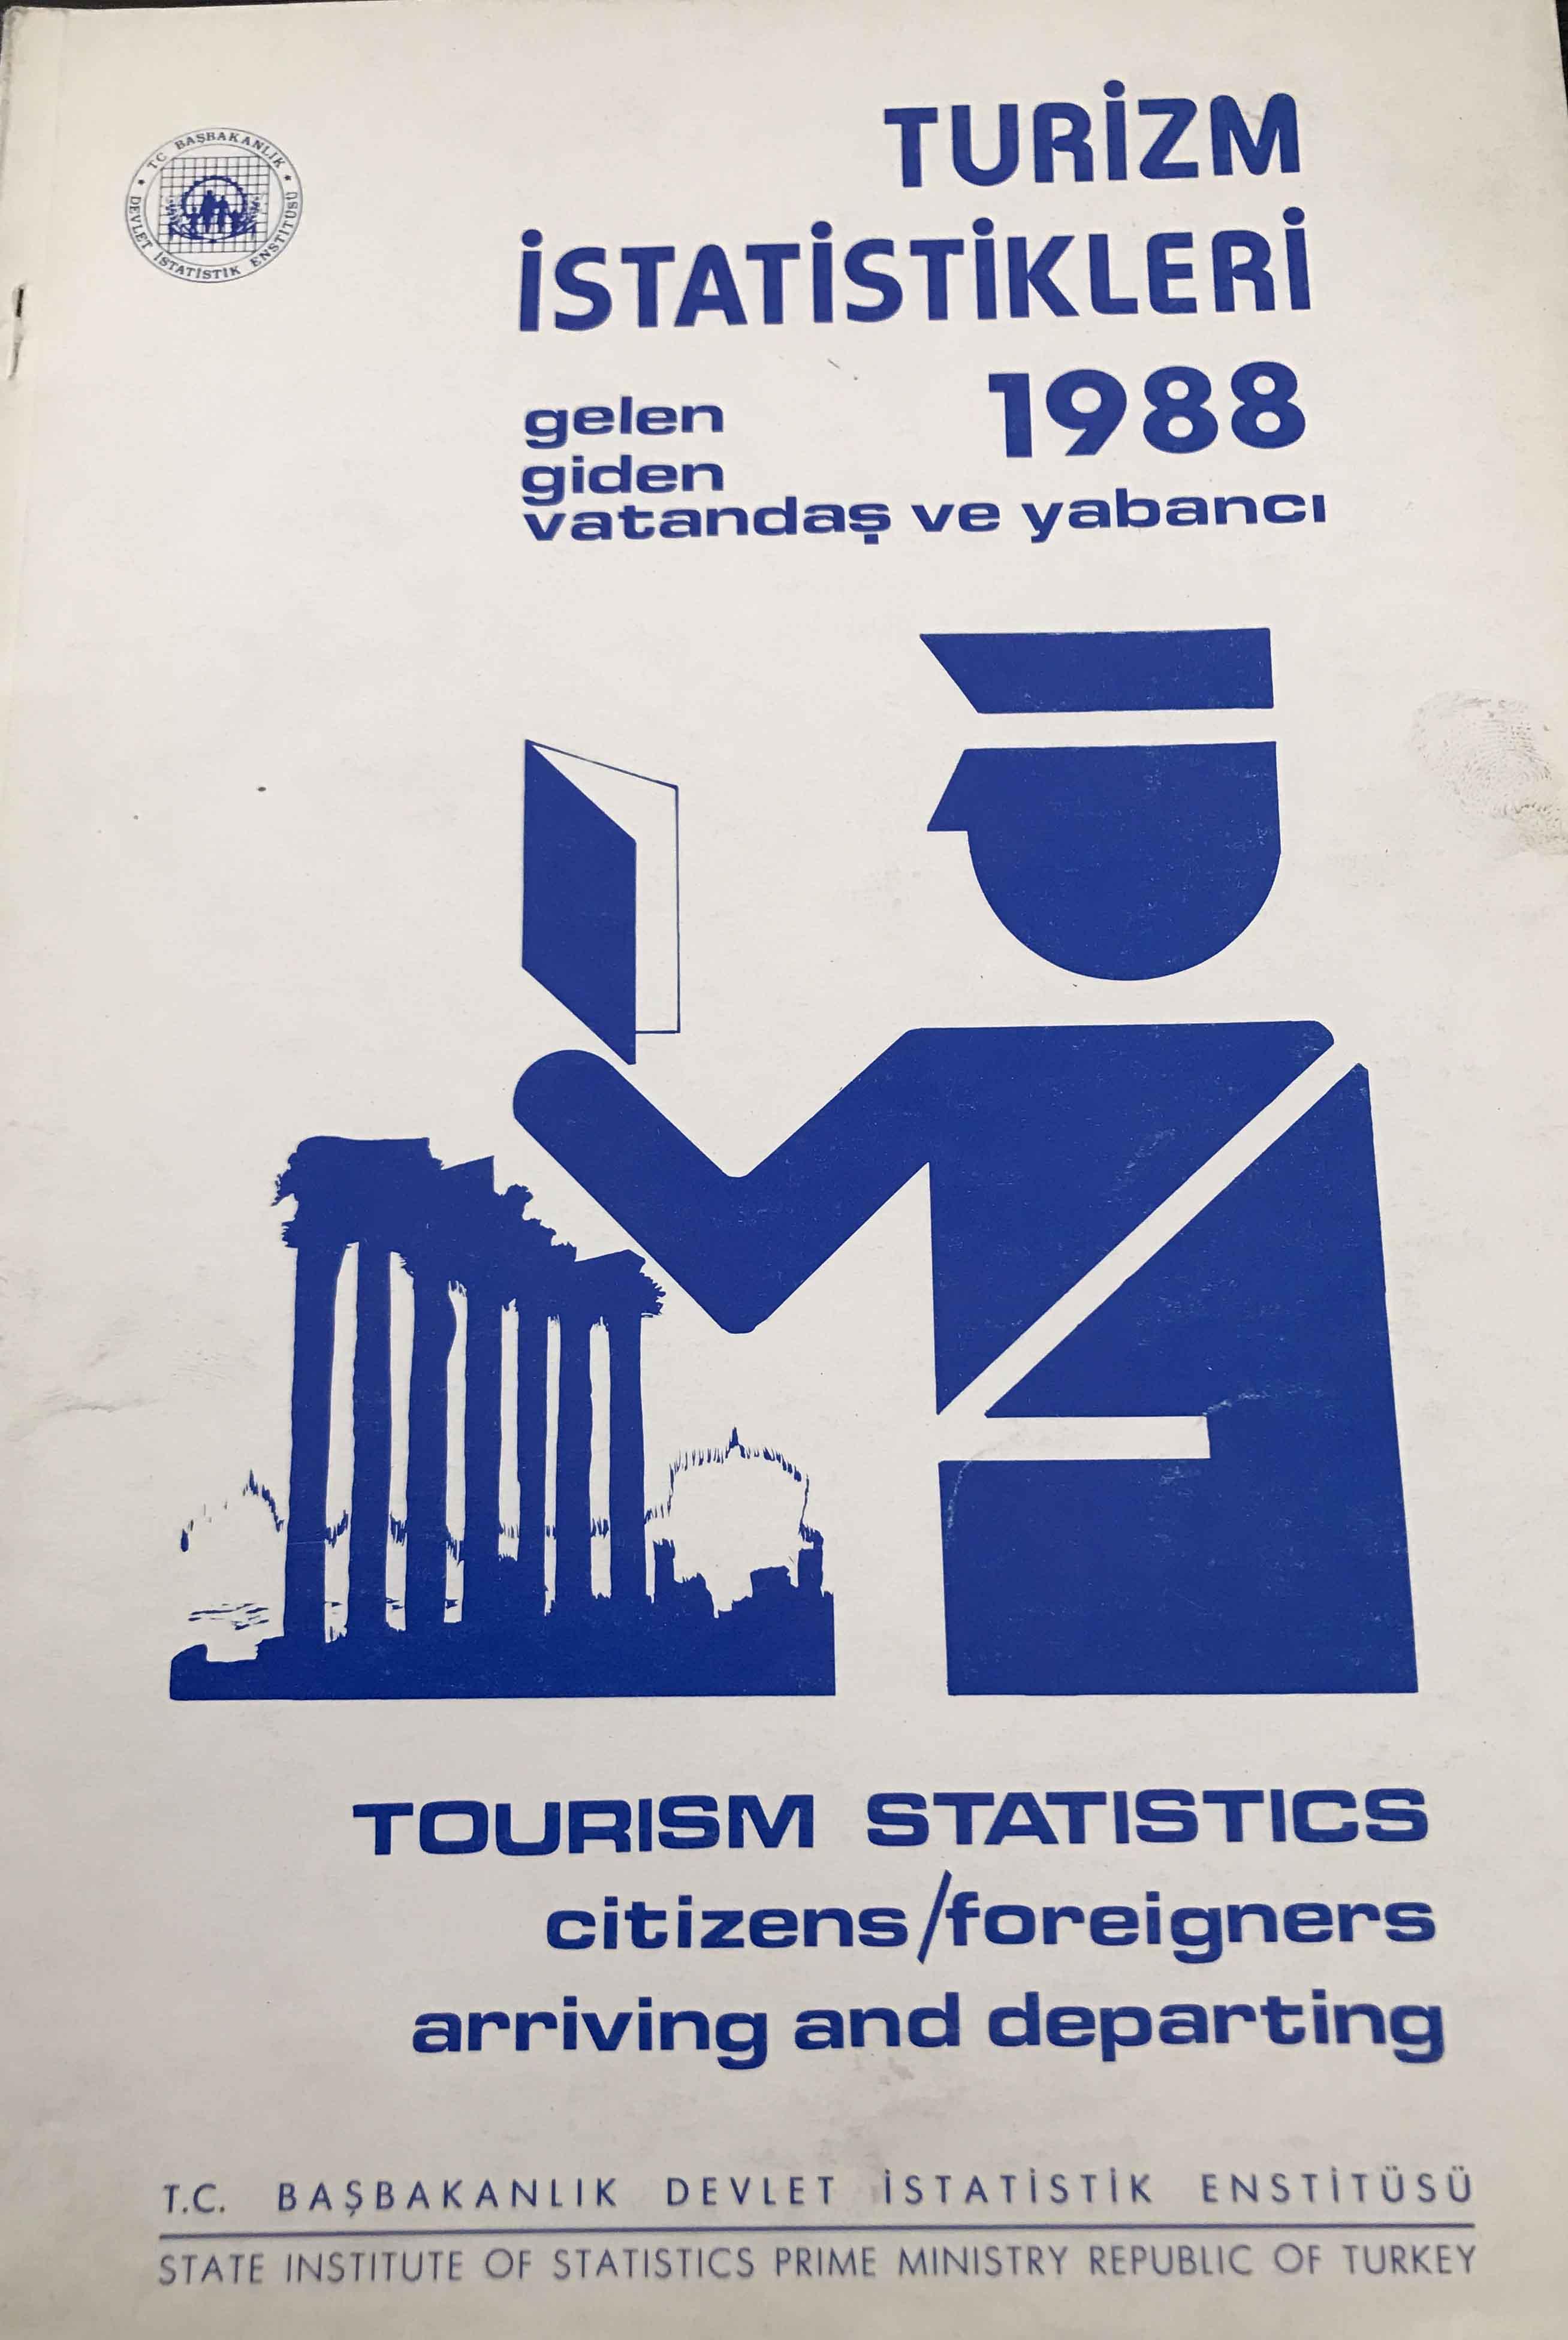 Turizm İstatistikleri 1988 Kitap Kapağı